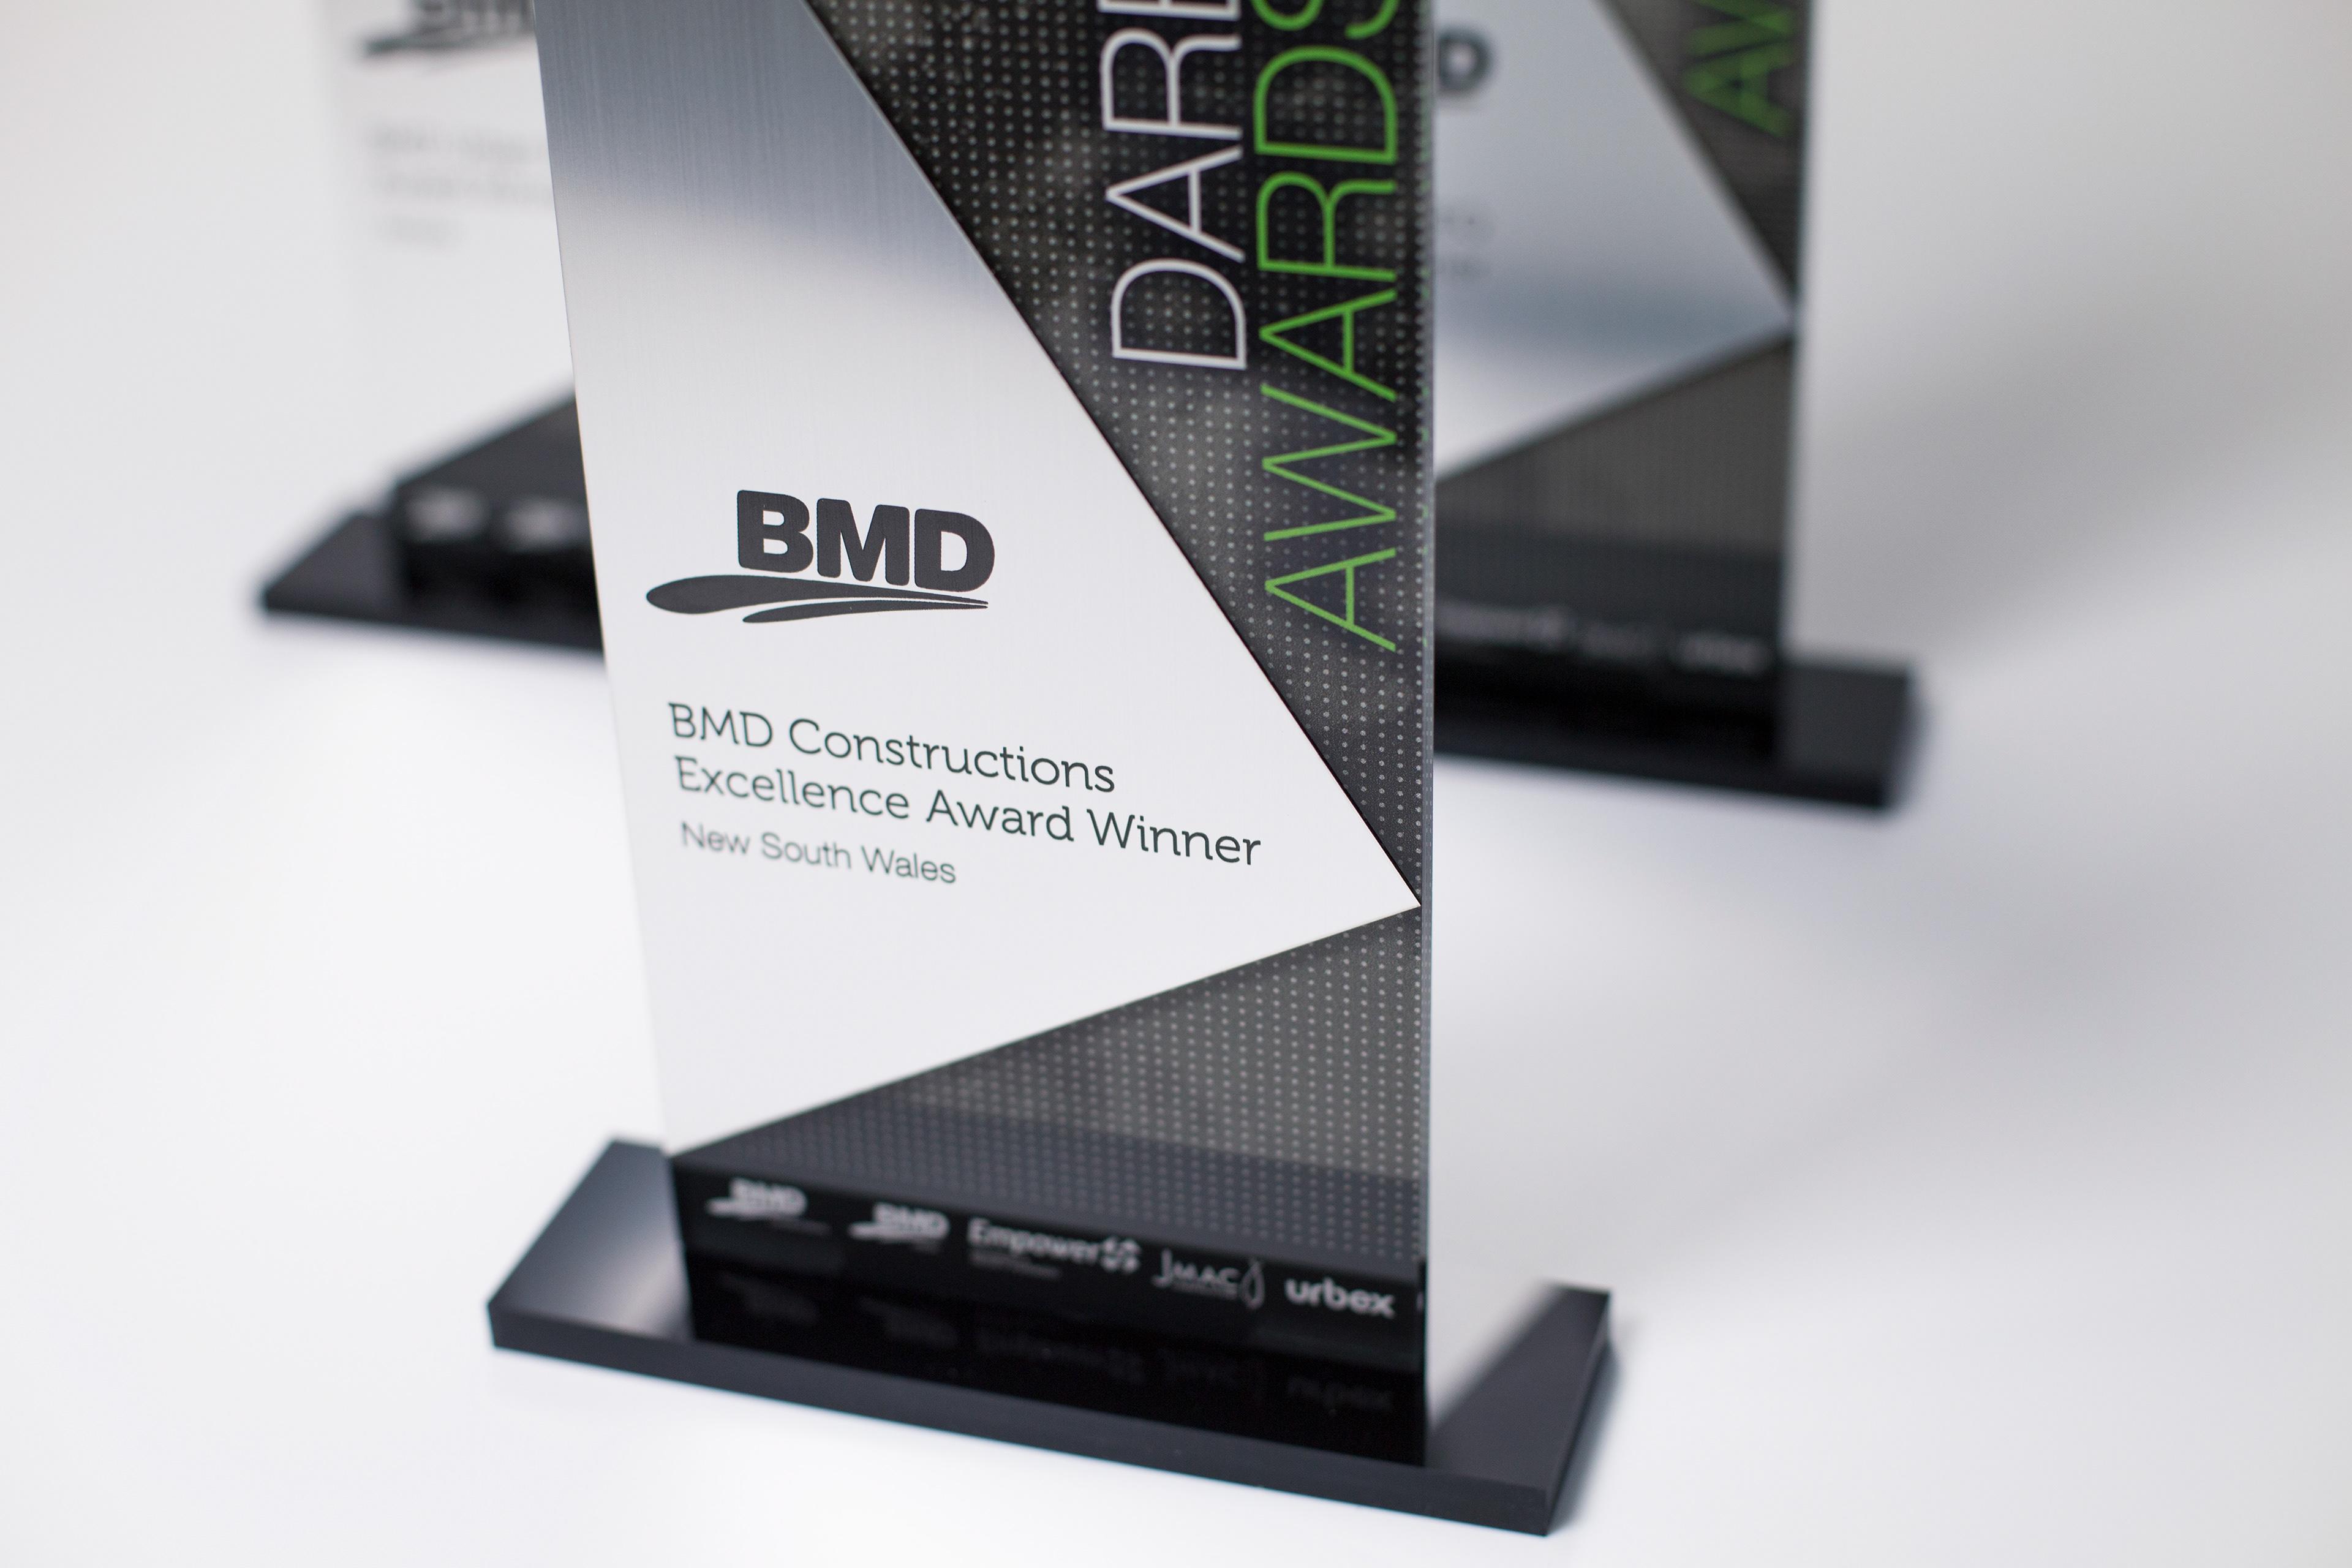 Kit Kreative - BMD Dare Awards 2016